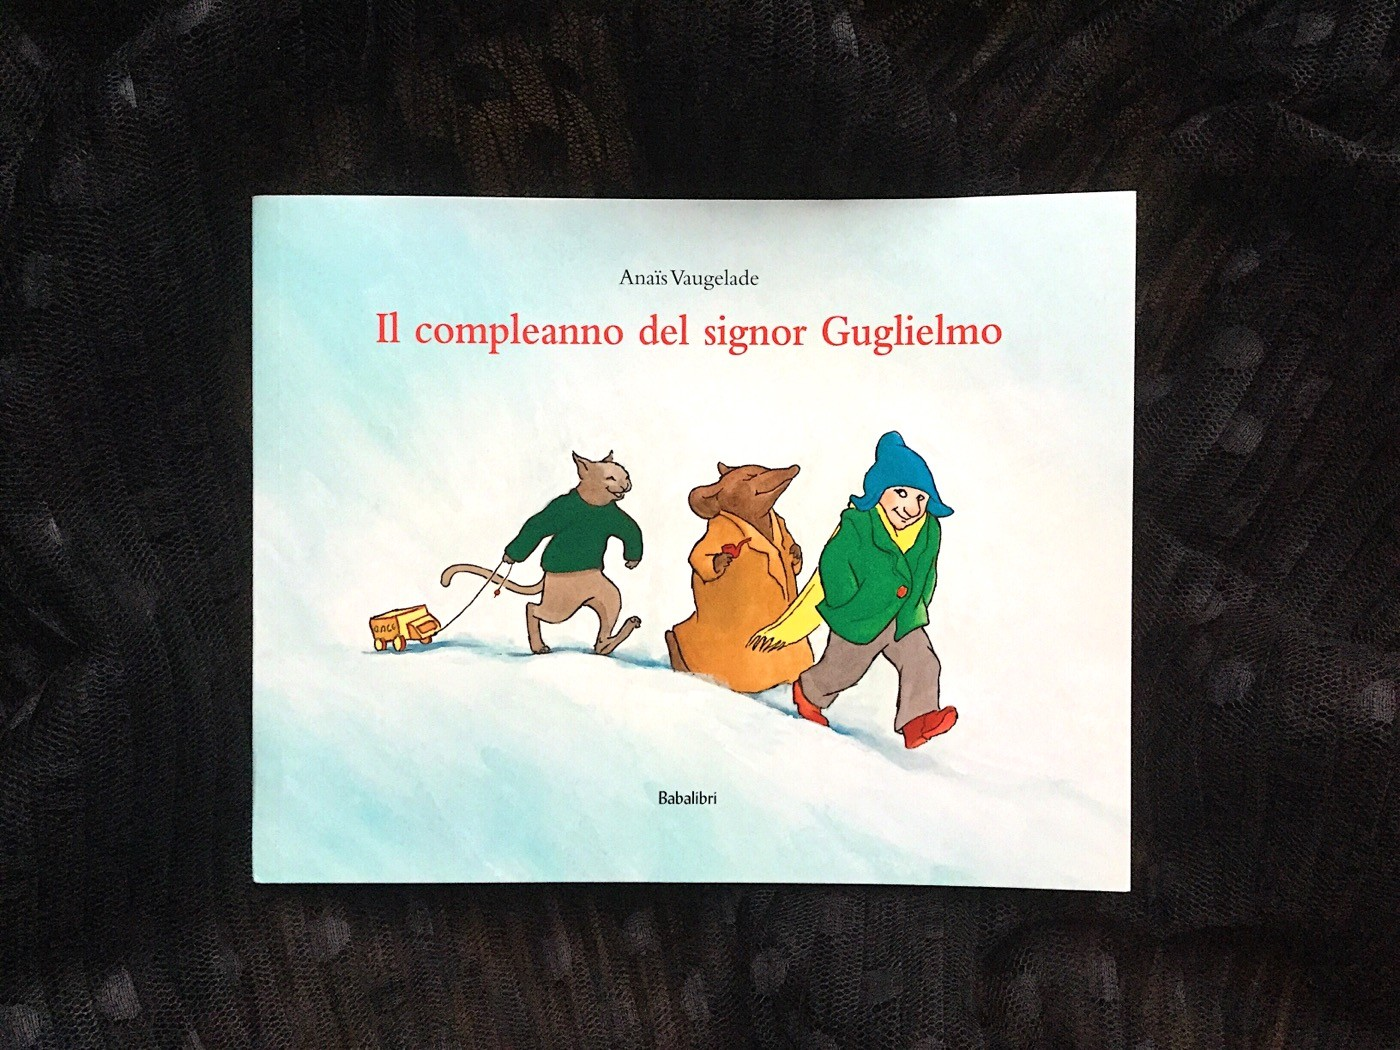 Compleanno-signor-guglielmo-Anais-Vaugelade-Babalibri-Galline-Volanti